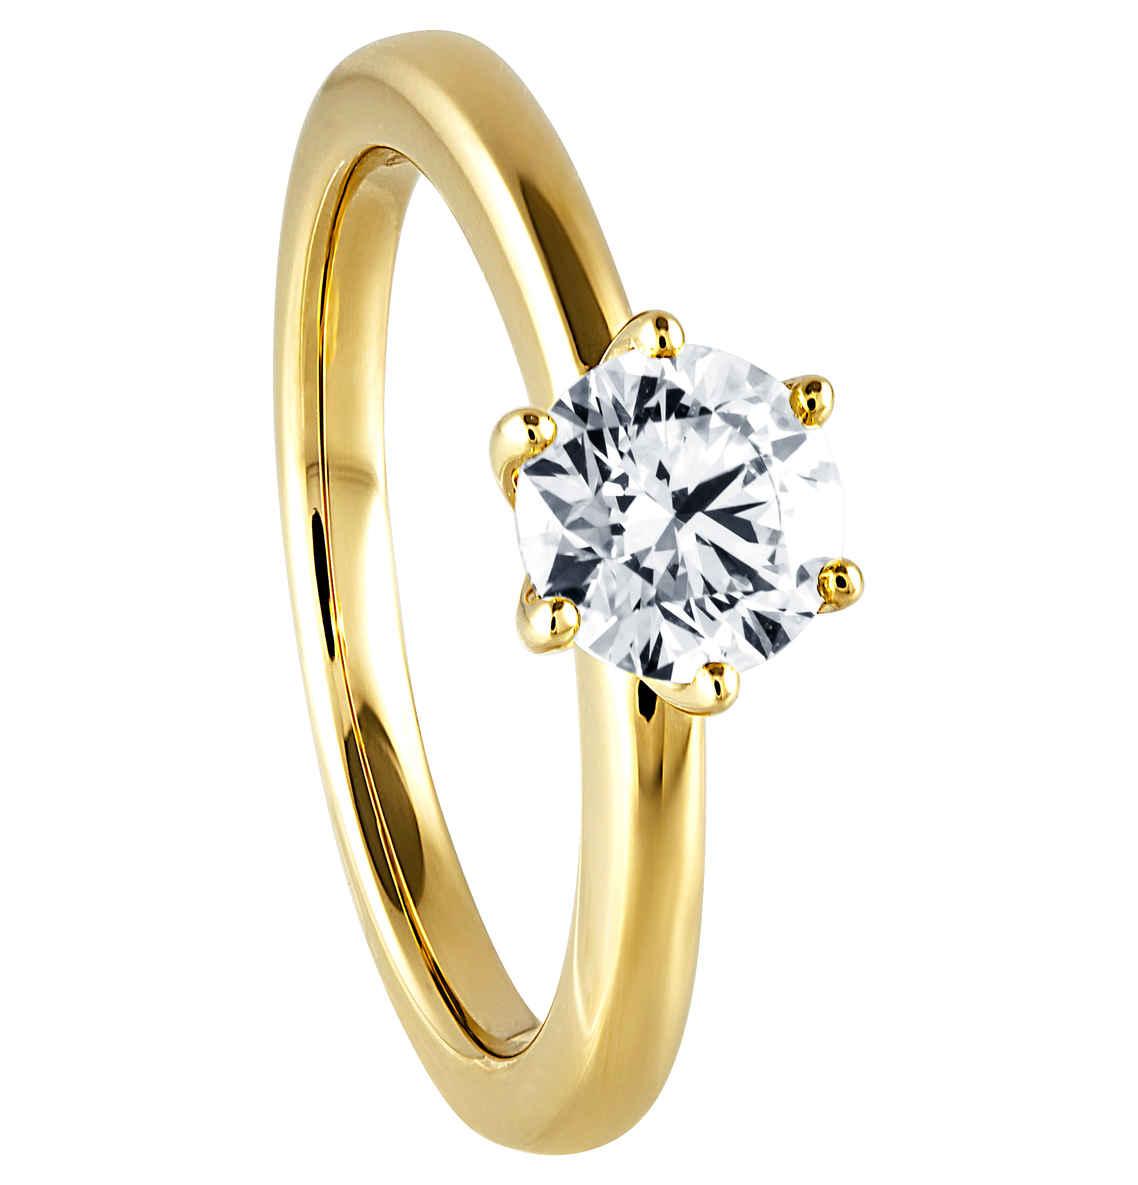 Moncara Diamant-Ring 585 Gelbgold, ca. 1,00 ct.  [Galeria Kaufhof bundesweit]